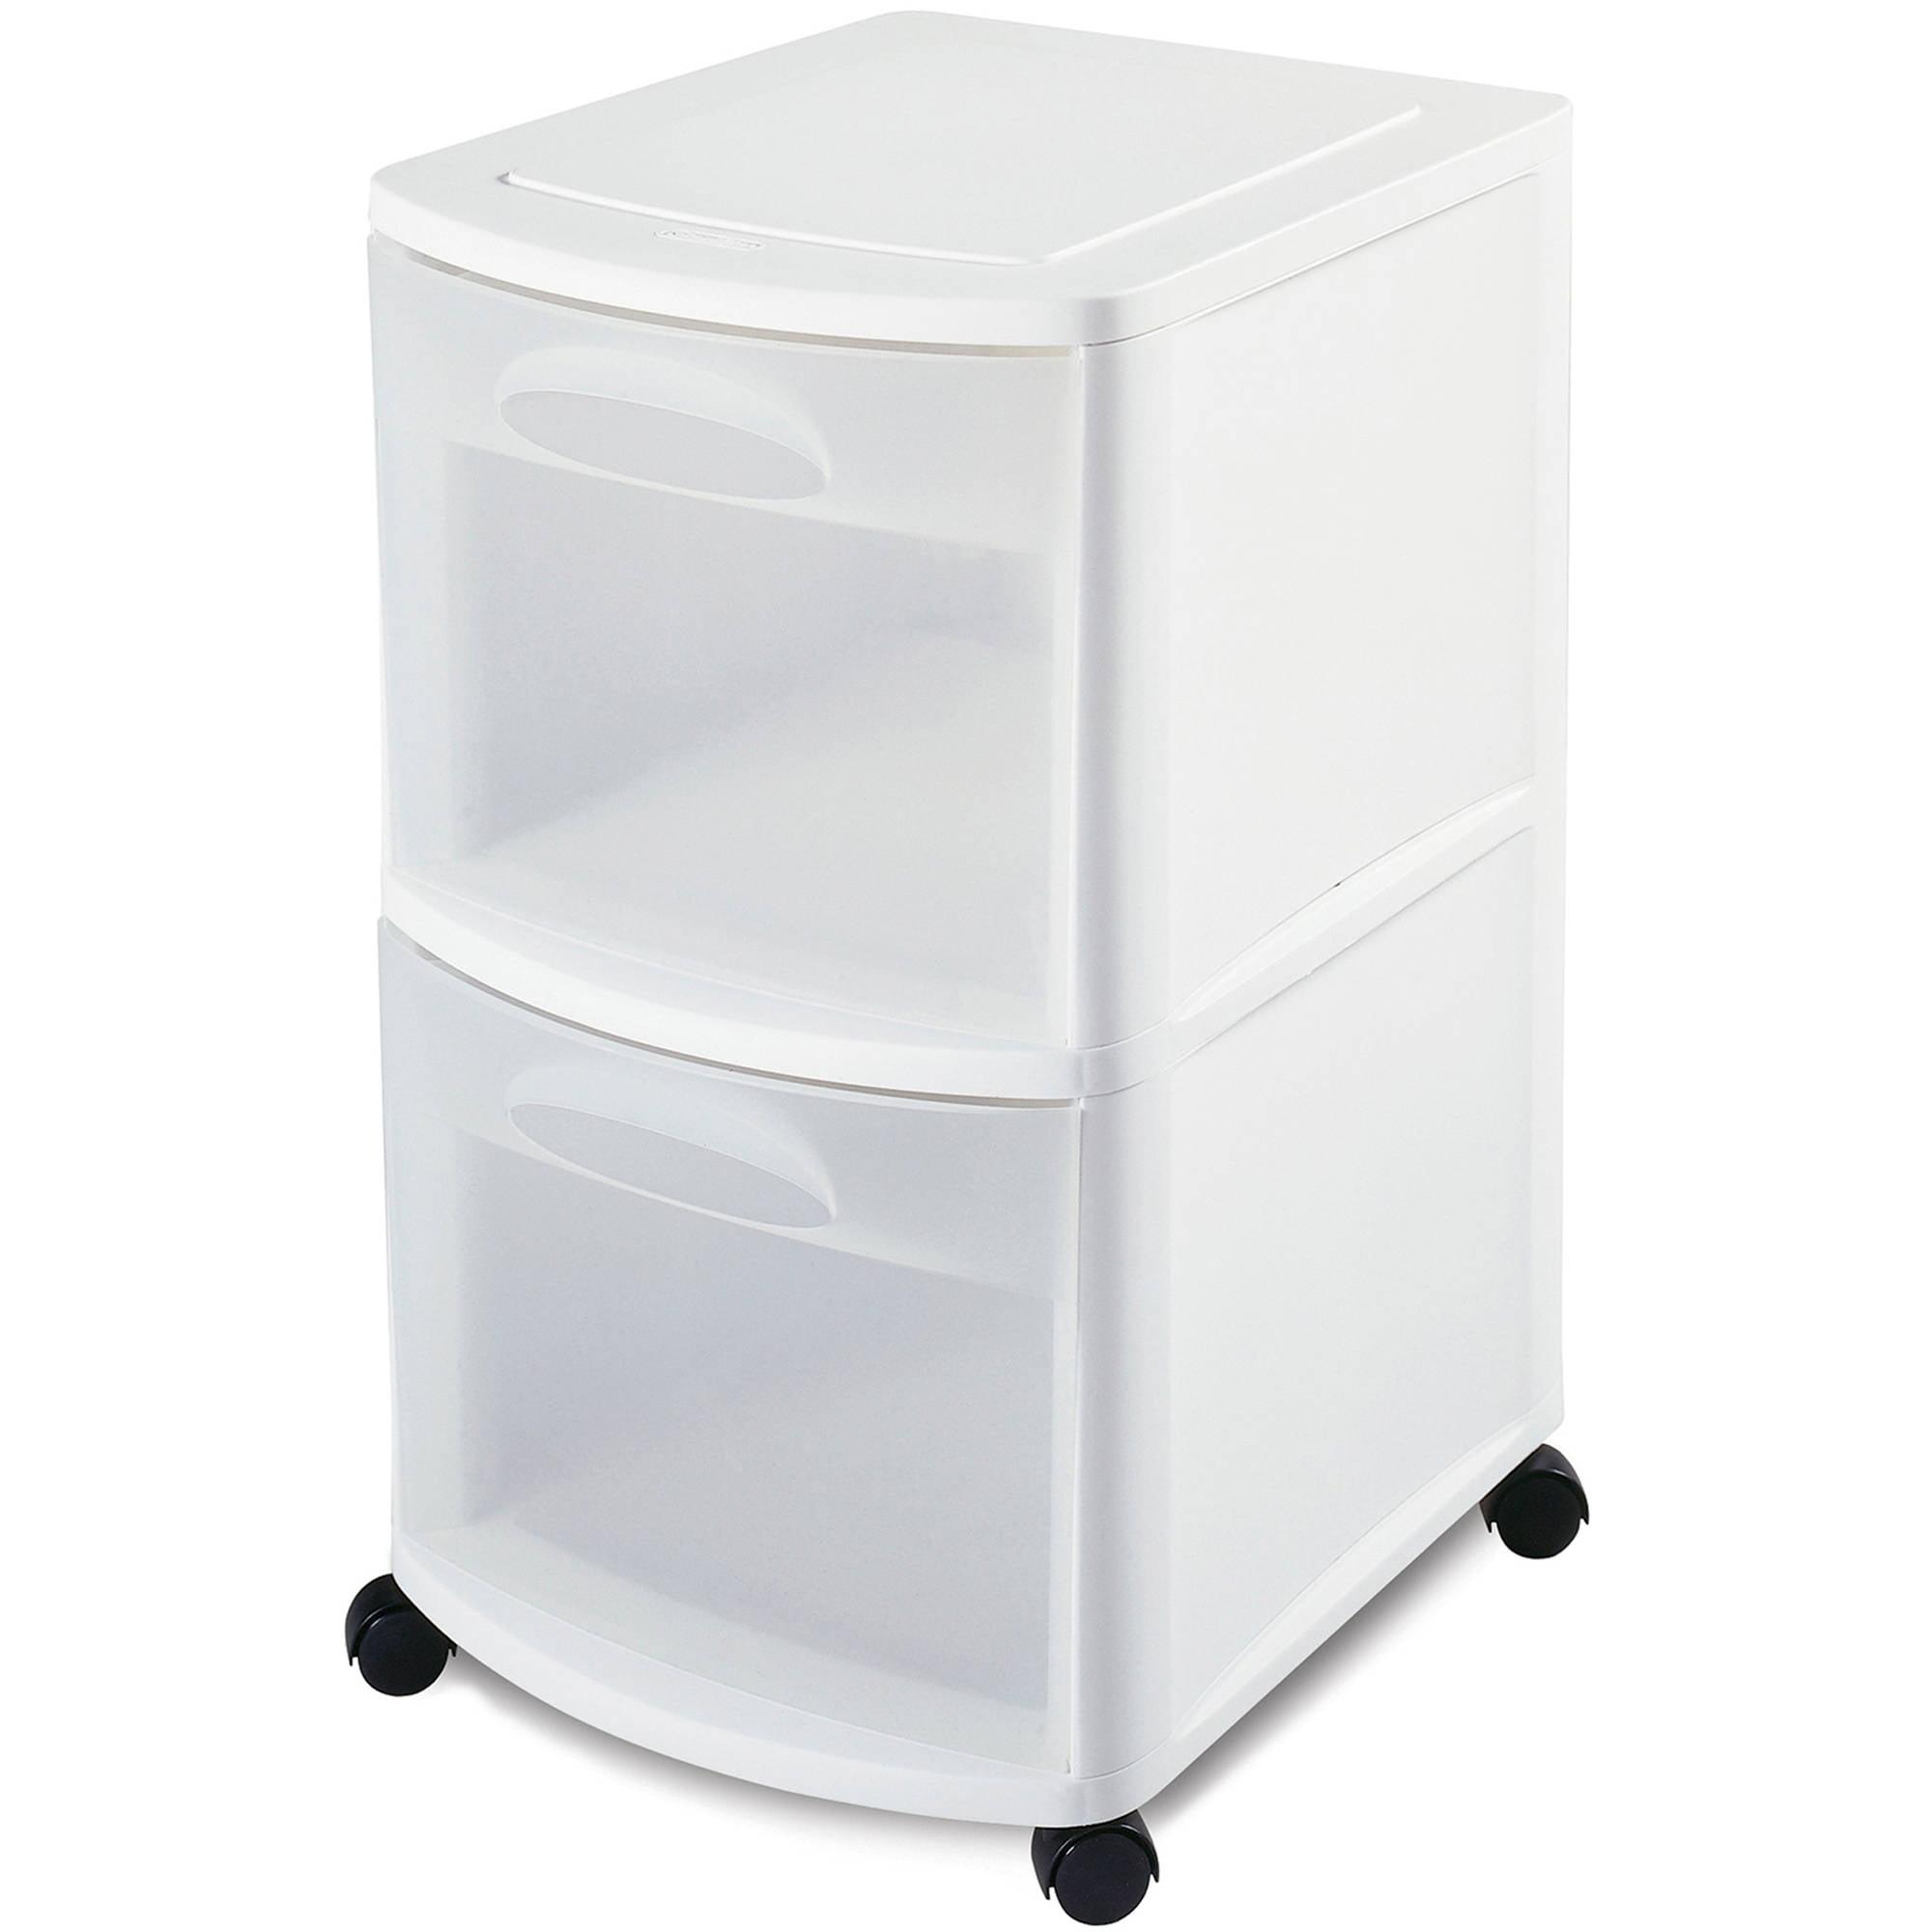 Sterilite 2 Drawer Cart- White - Walmart.com